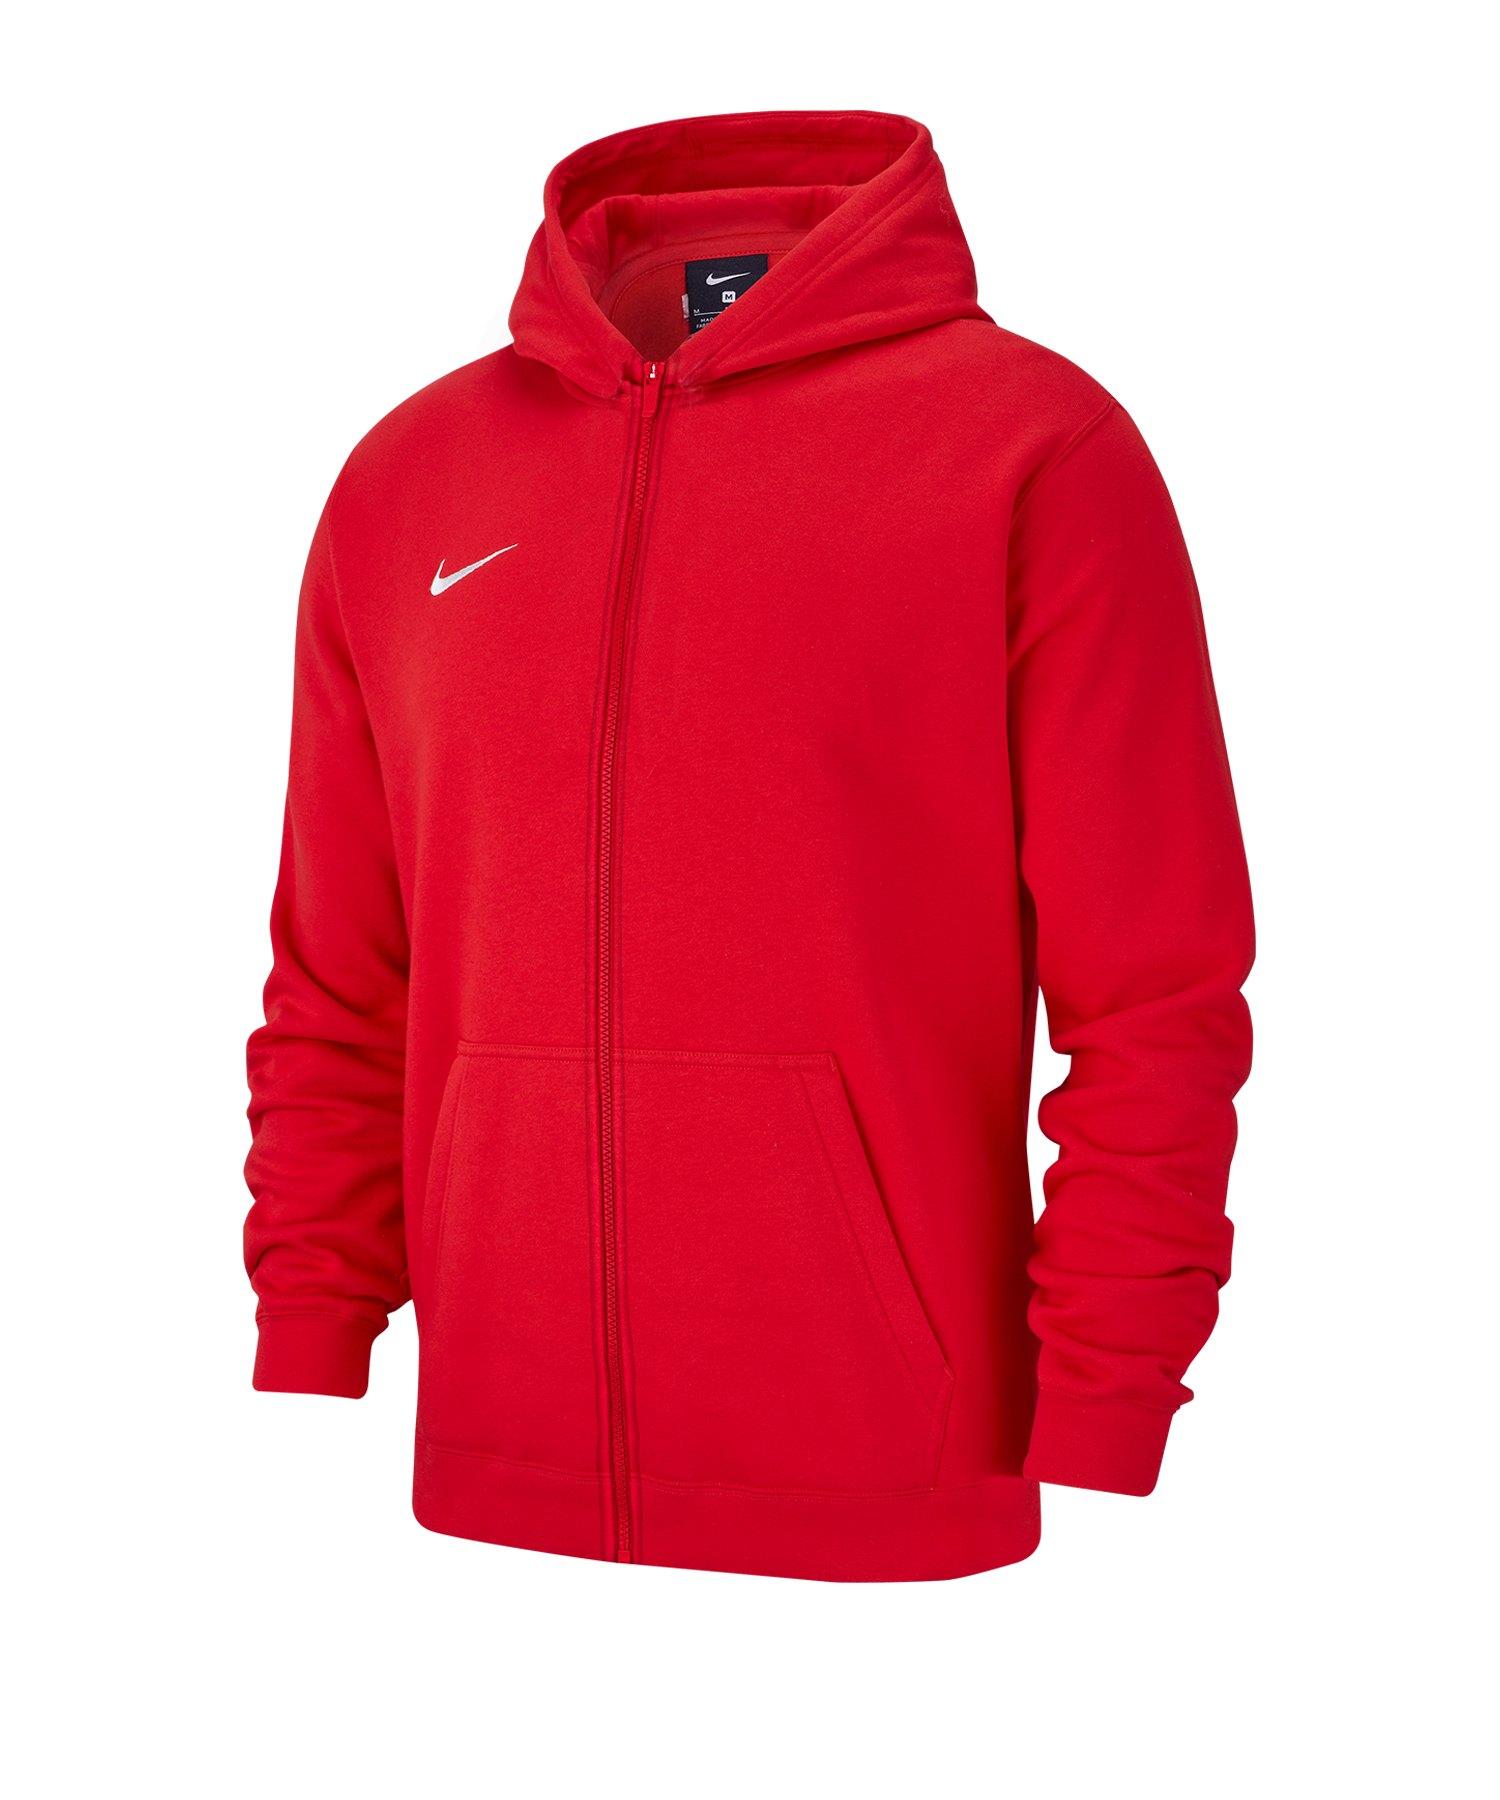 Nike Club 19 Fleece Kapuzenjacke Kids Rot F657 - rot